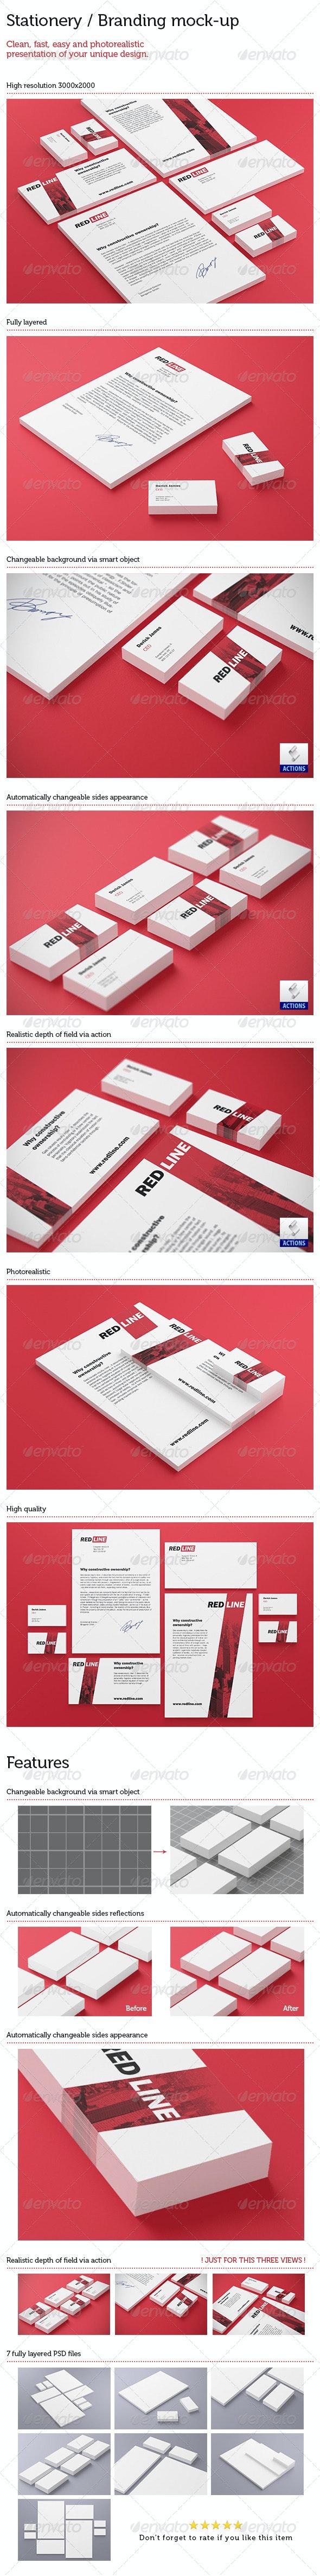 Stationery / Branding Mock Up - Print Product Mock-Ups